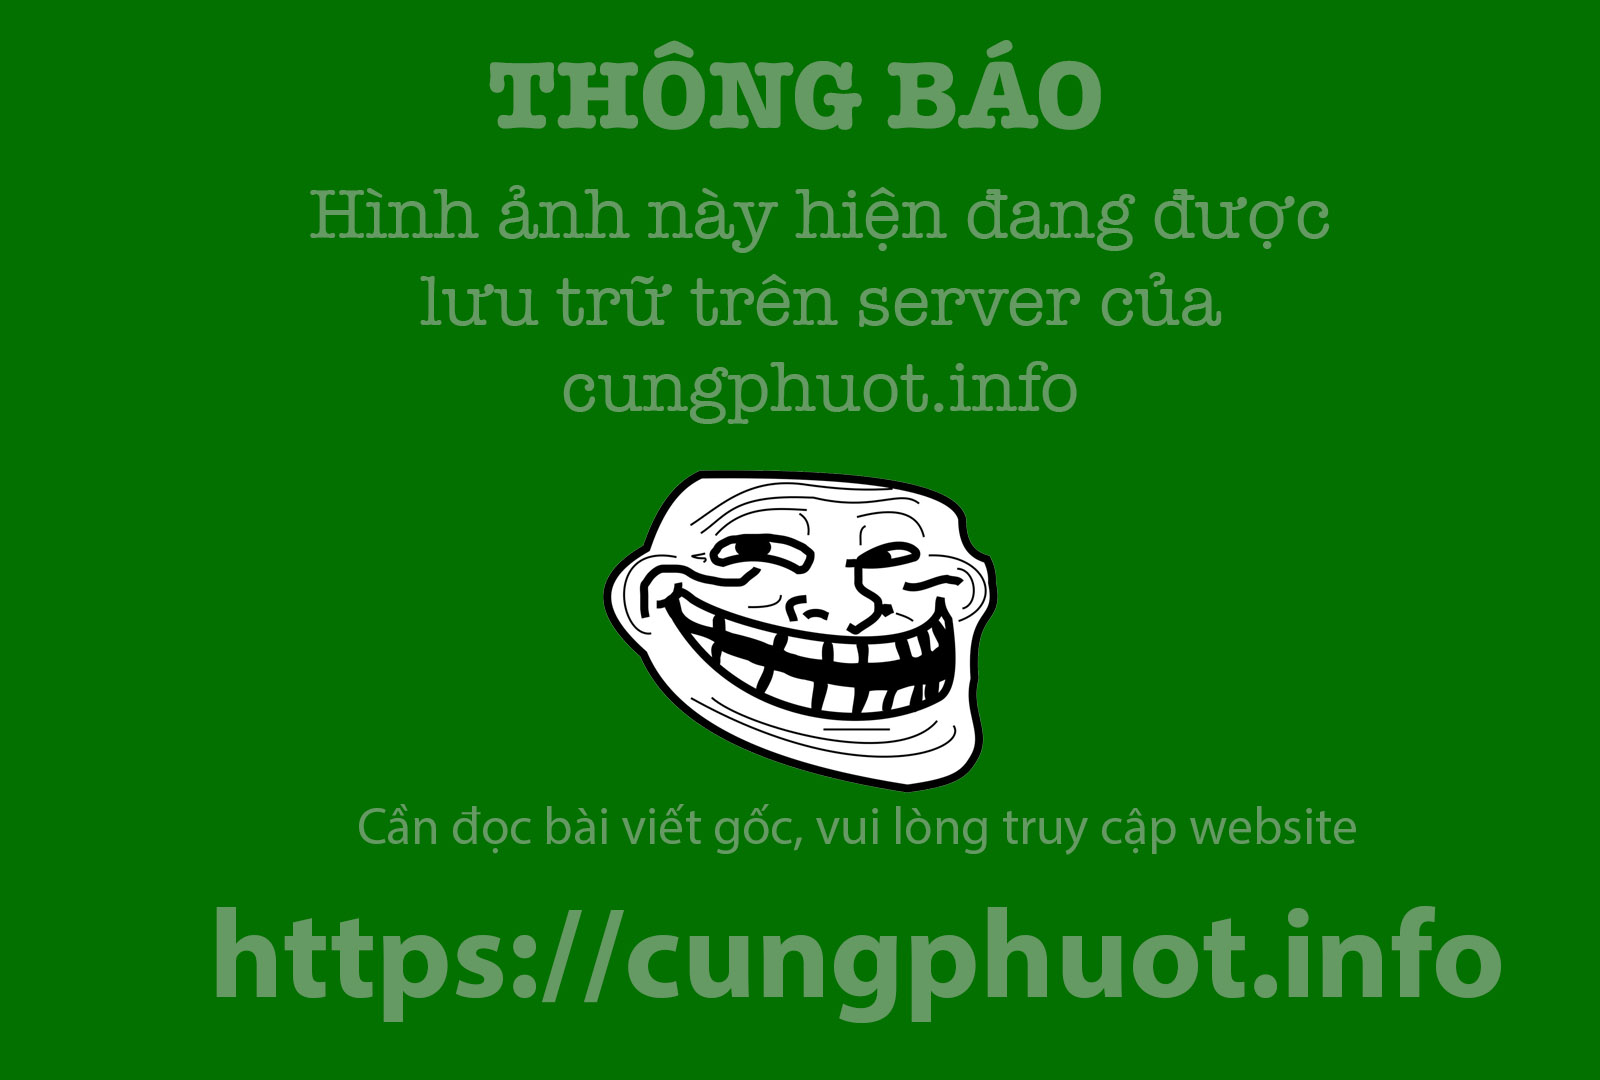 Co do Hue dep la trong suong mu hinh anh 15